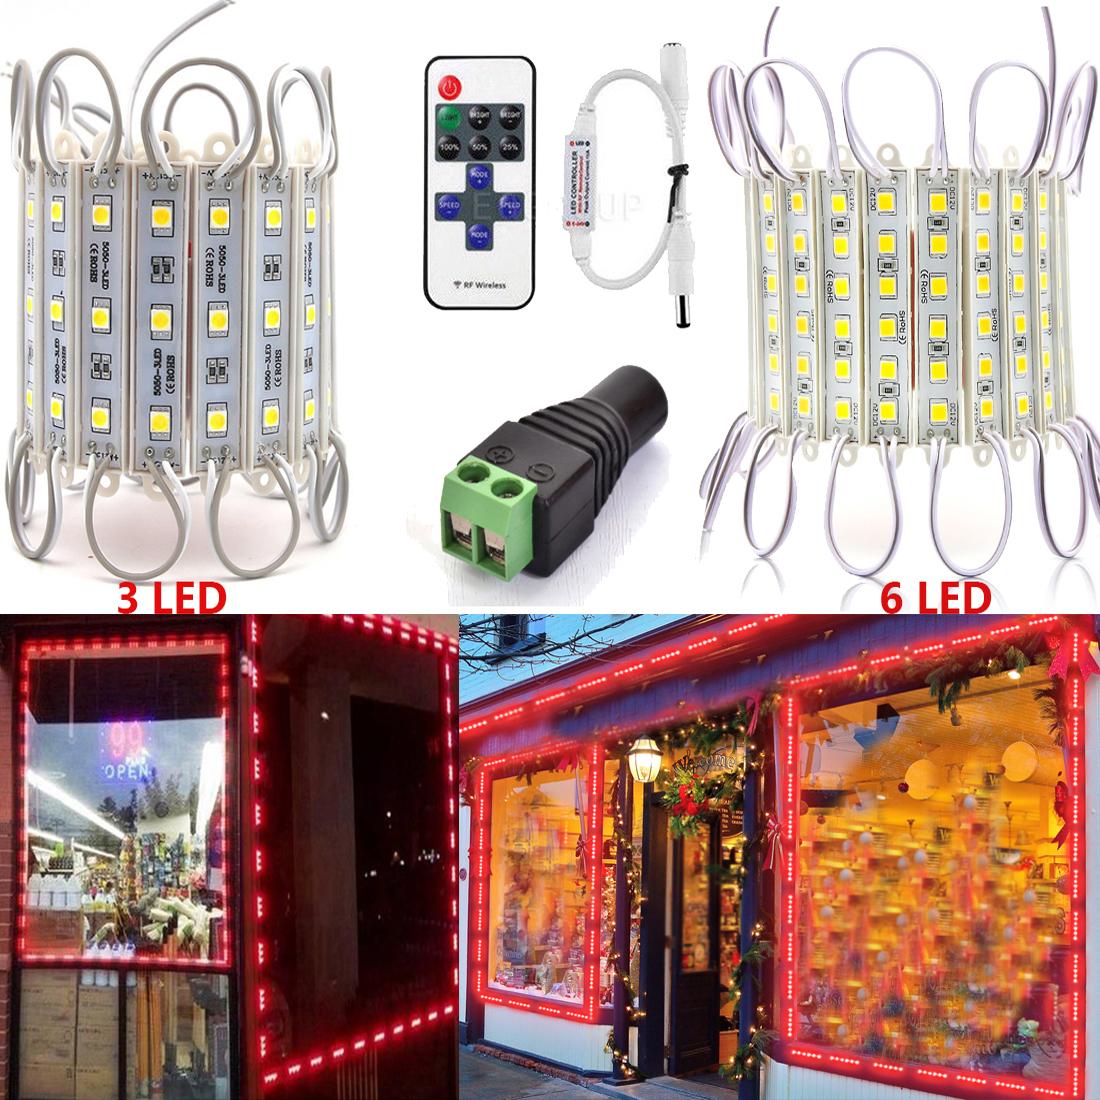 Superbright 5050 SMD 3 LED Module Light Waterproof AD Sign Decorative Lamp DC12V